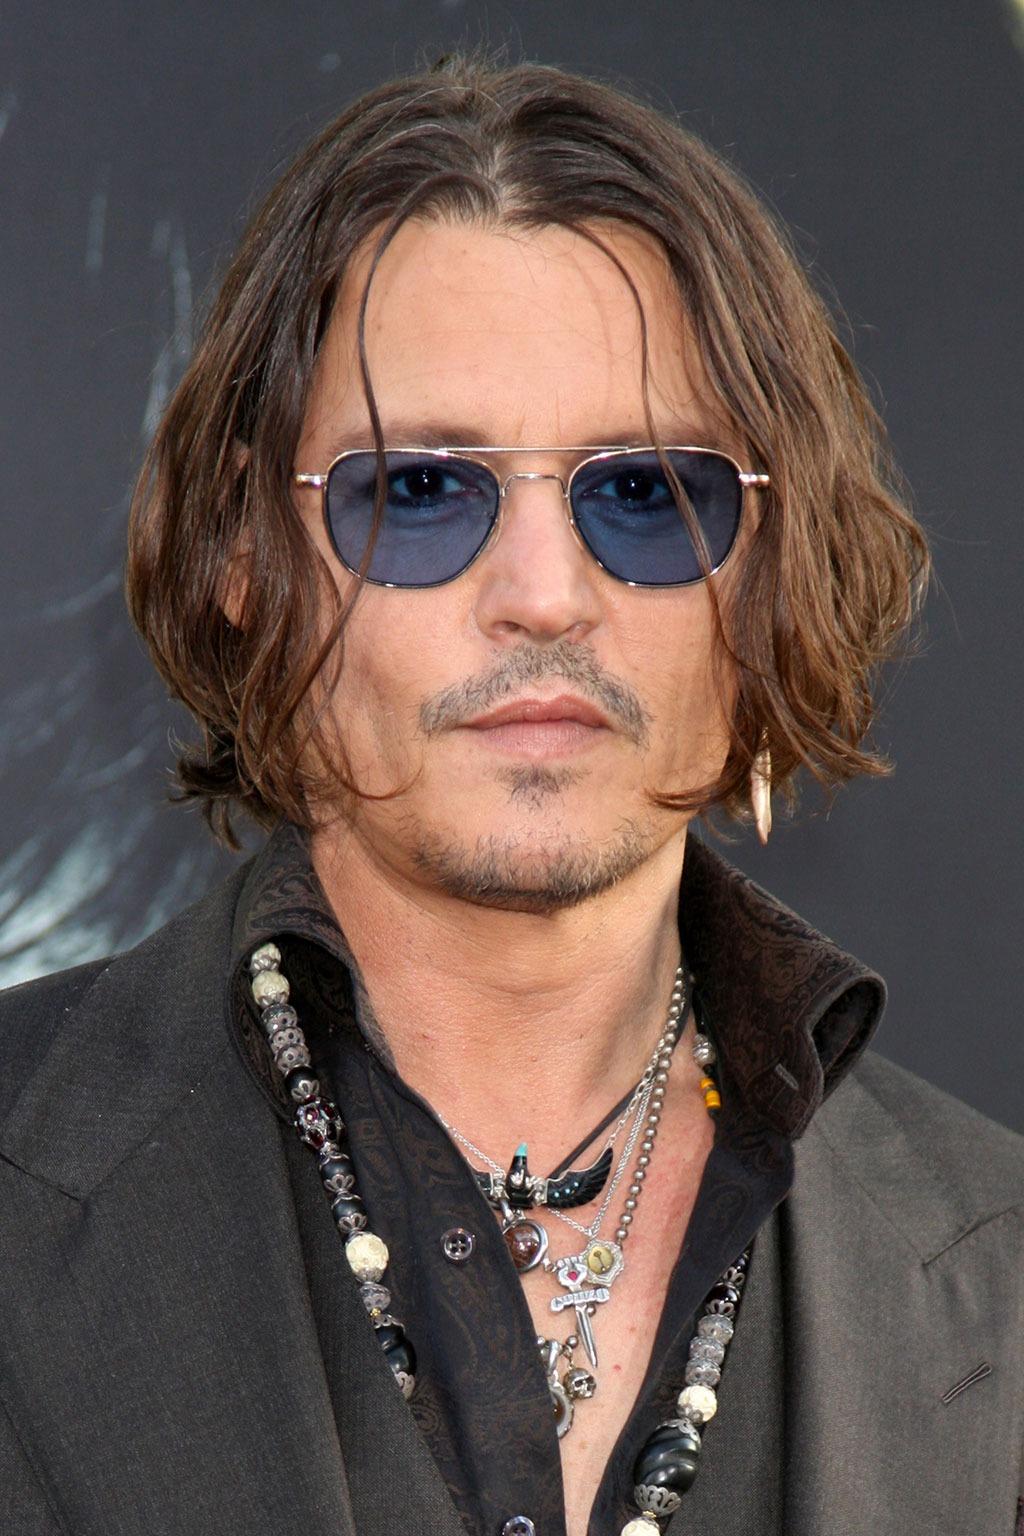 Johnny Depp hairstyles for men over 40